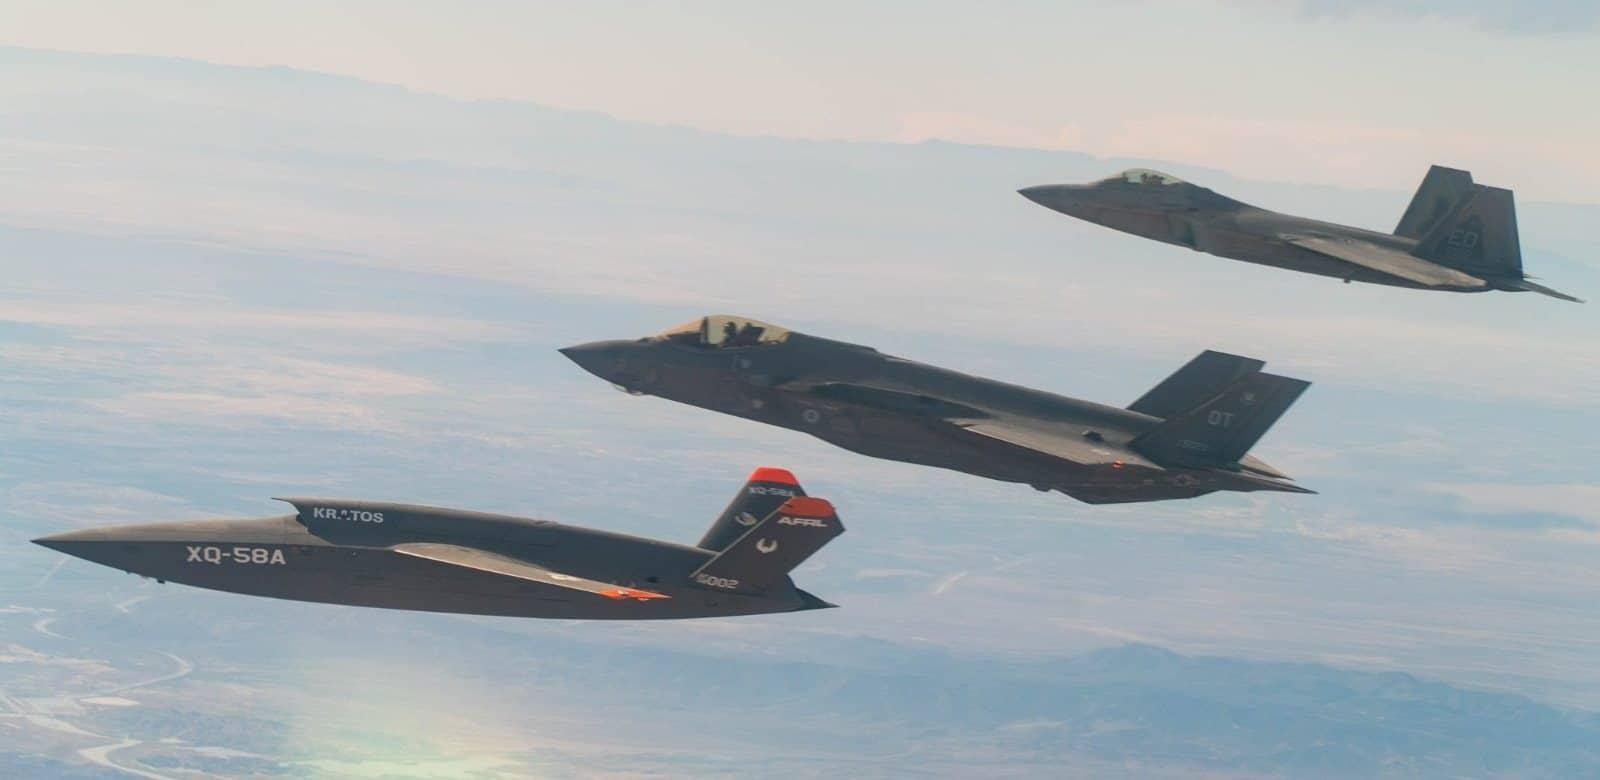 F-35A, XQ-58A і F-22 в строю під час випробувань gatewayOne